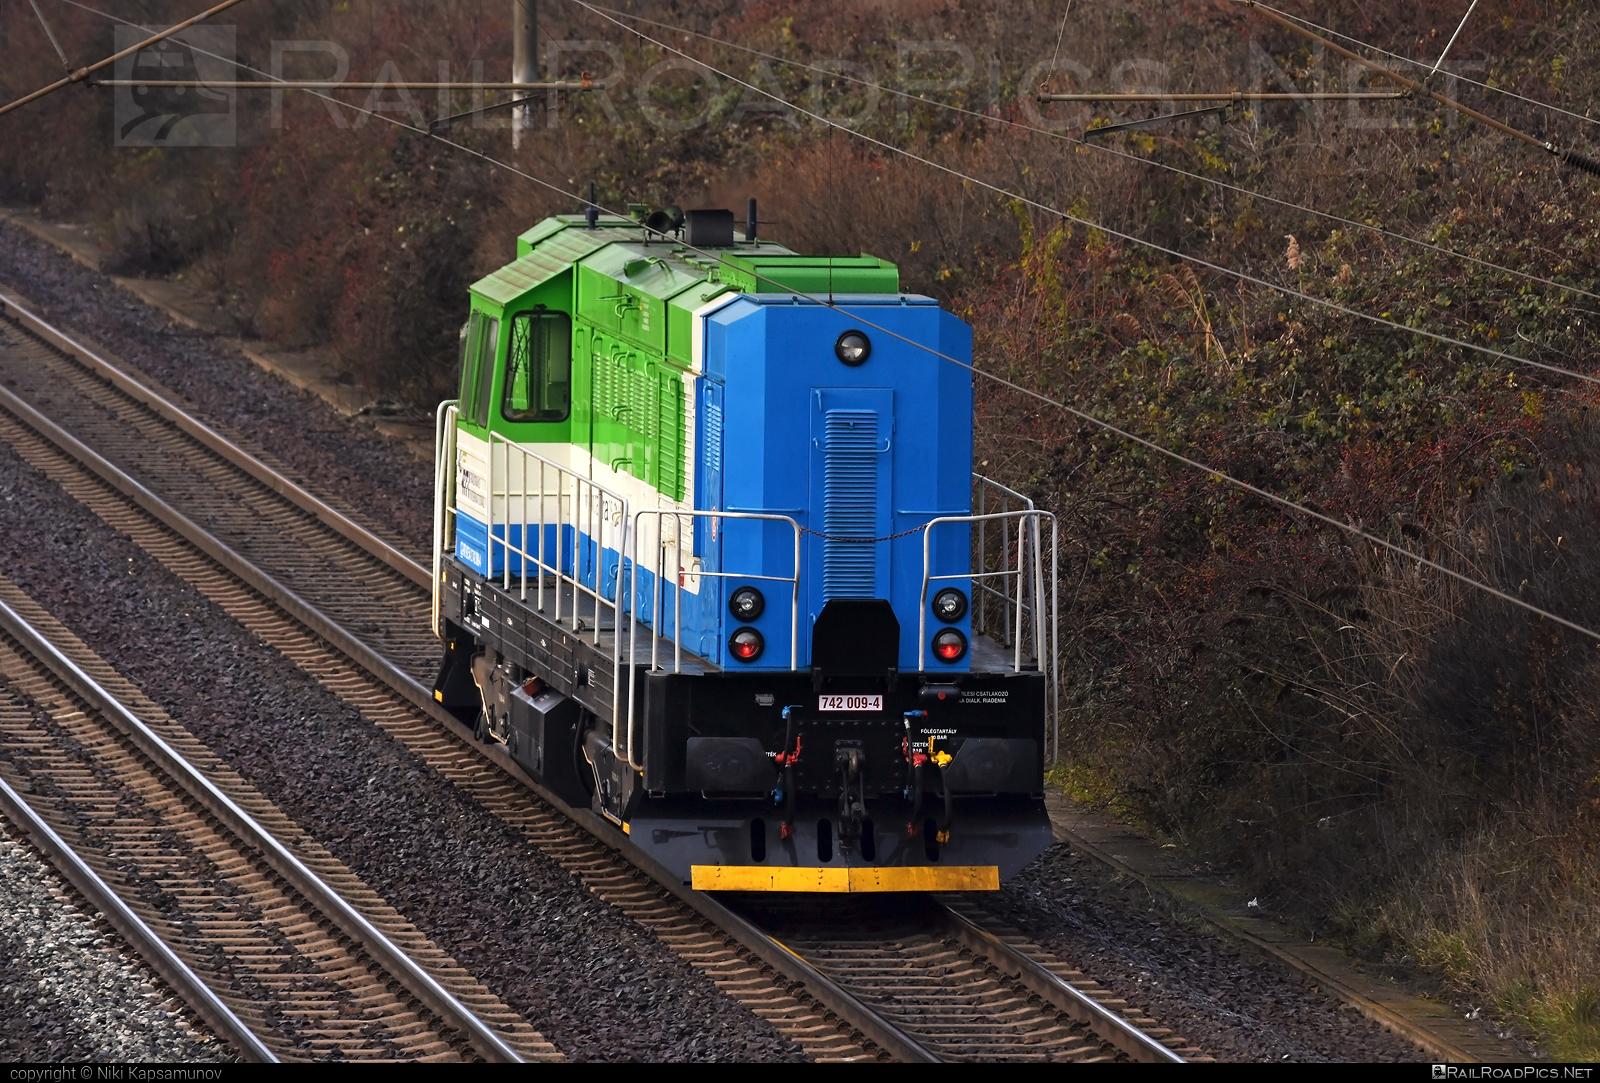 ČKD T 466.2 (742) - 742 009-4 operated by Railtrans International, s.r.o #ckd #ckd4662 #ckd742 #ckdt4662 #kocur #rti